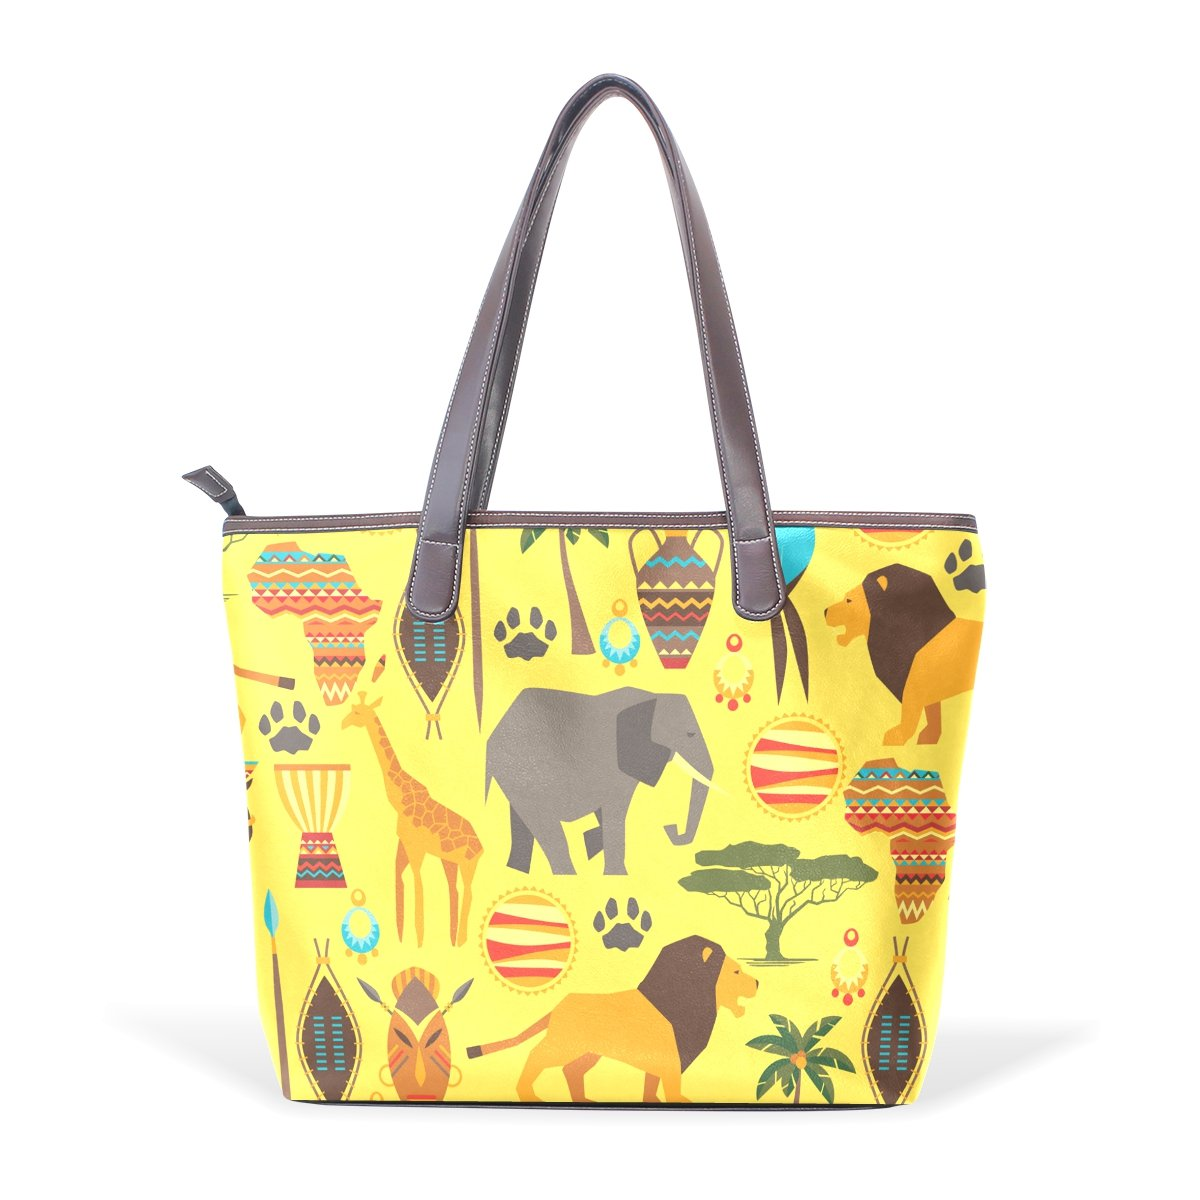 Cute Cartoon Elephant Pattern Print Womens Fashion Large Shoulder Bag Handbag Tote Purse for Lady